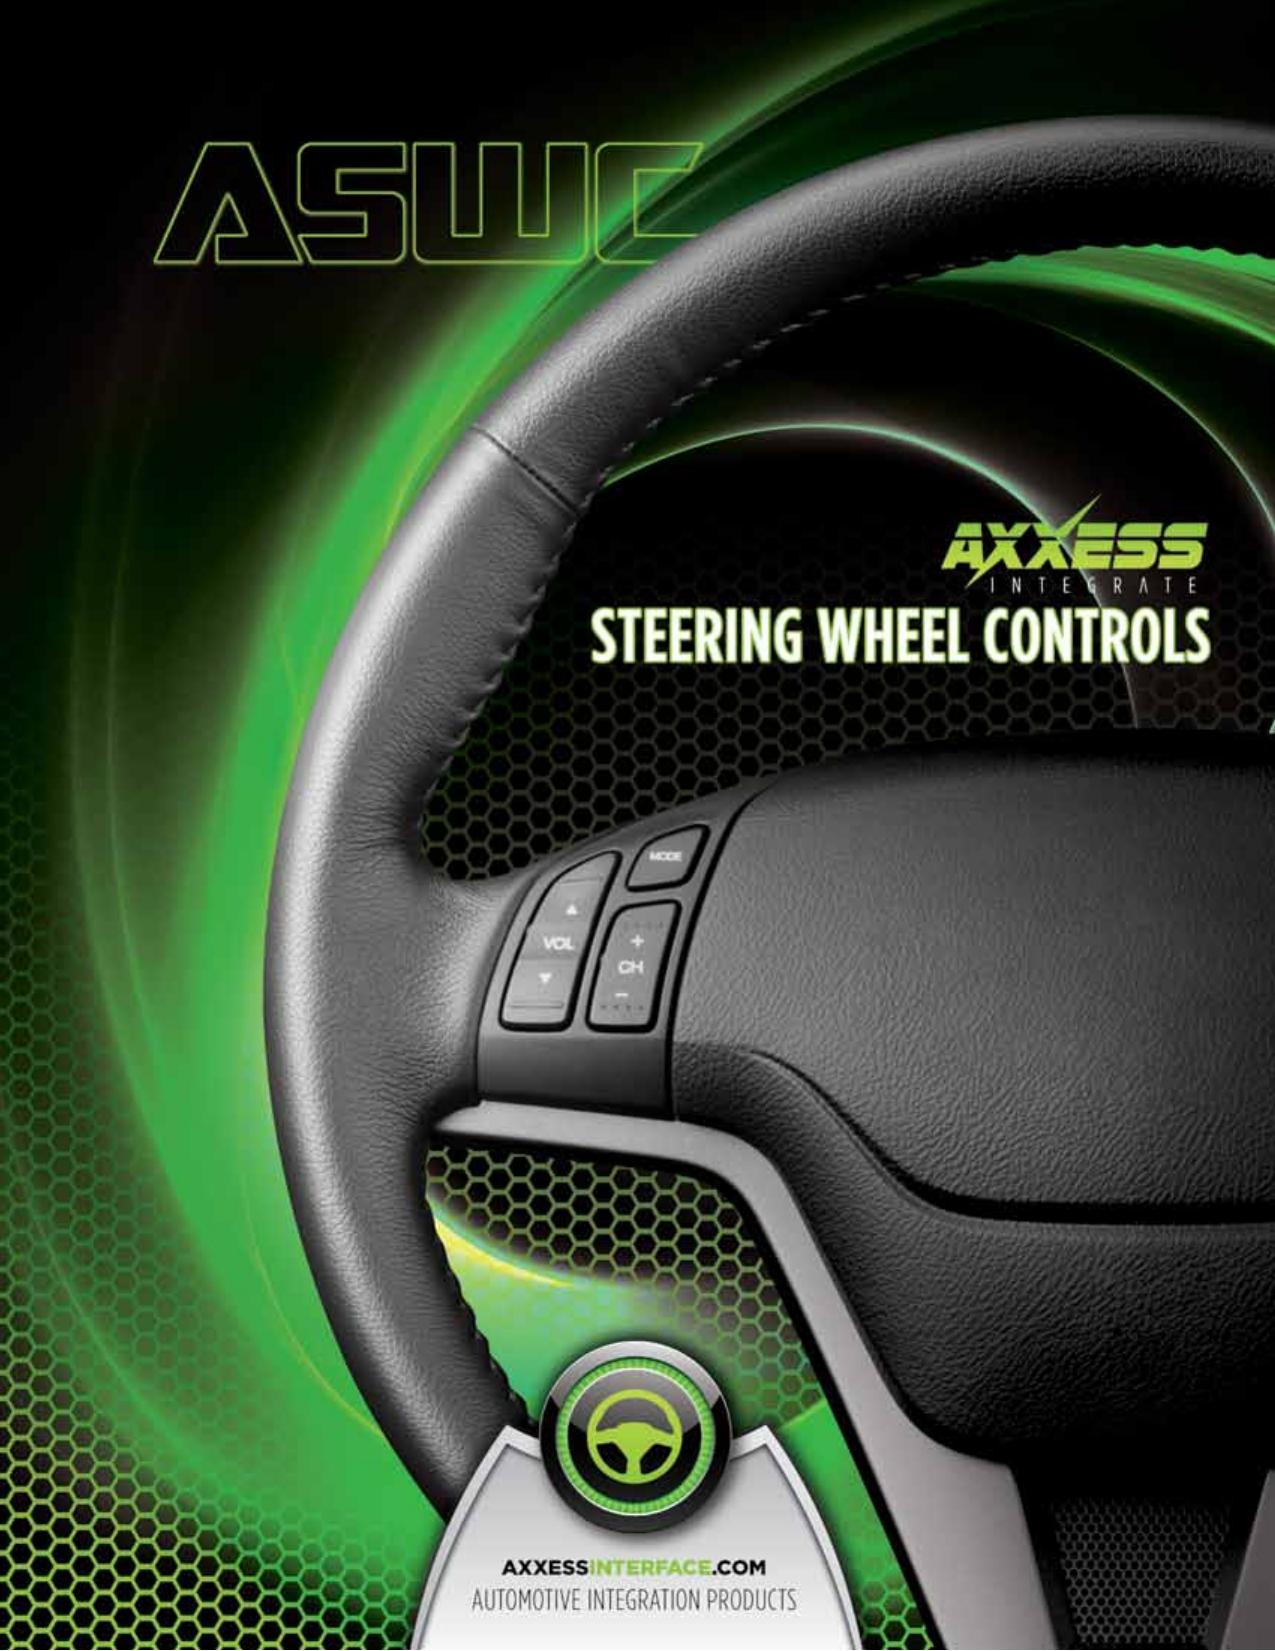 ASWC_2012_BROCHURE.pdf 0 download free pdf for sony xplod mex bt2700 car receiver manual sony mex-bt2700 manual pdf at n-0.co